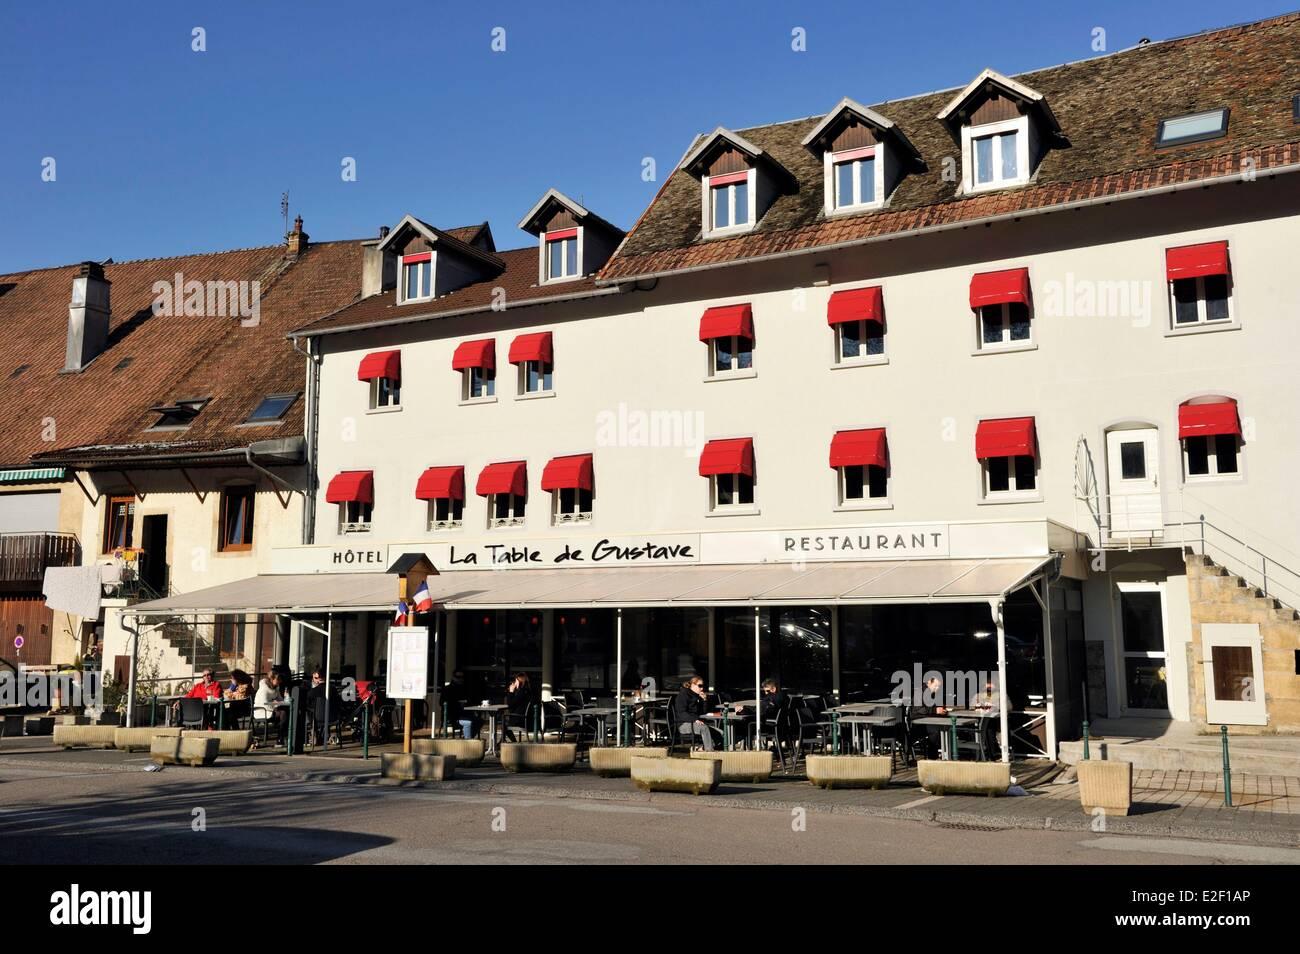 france, doubs, ornans, la table de gustave hotel stock photo